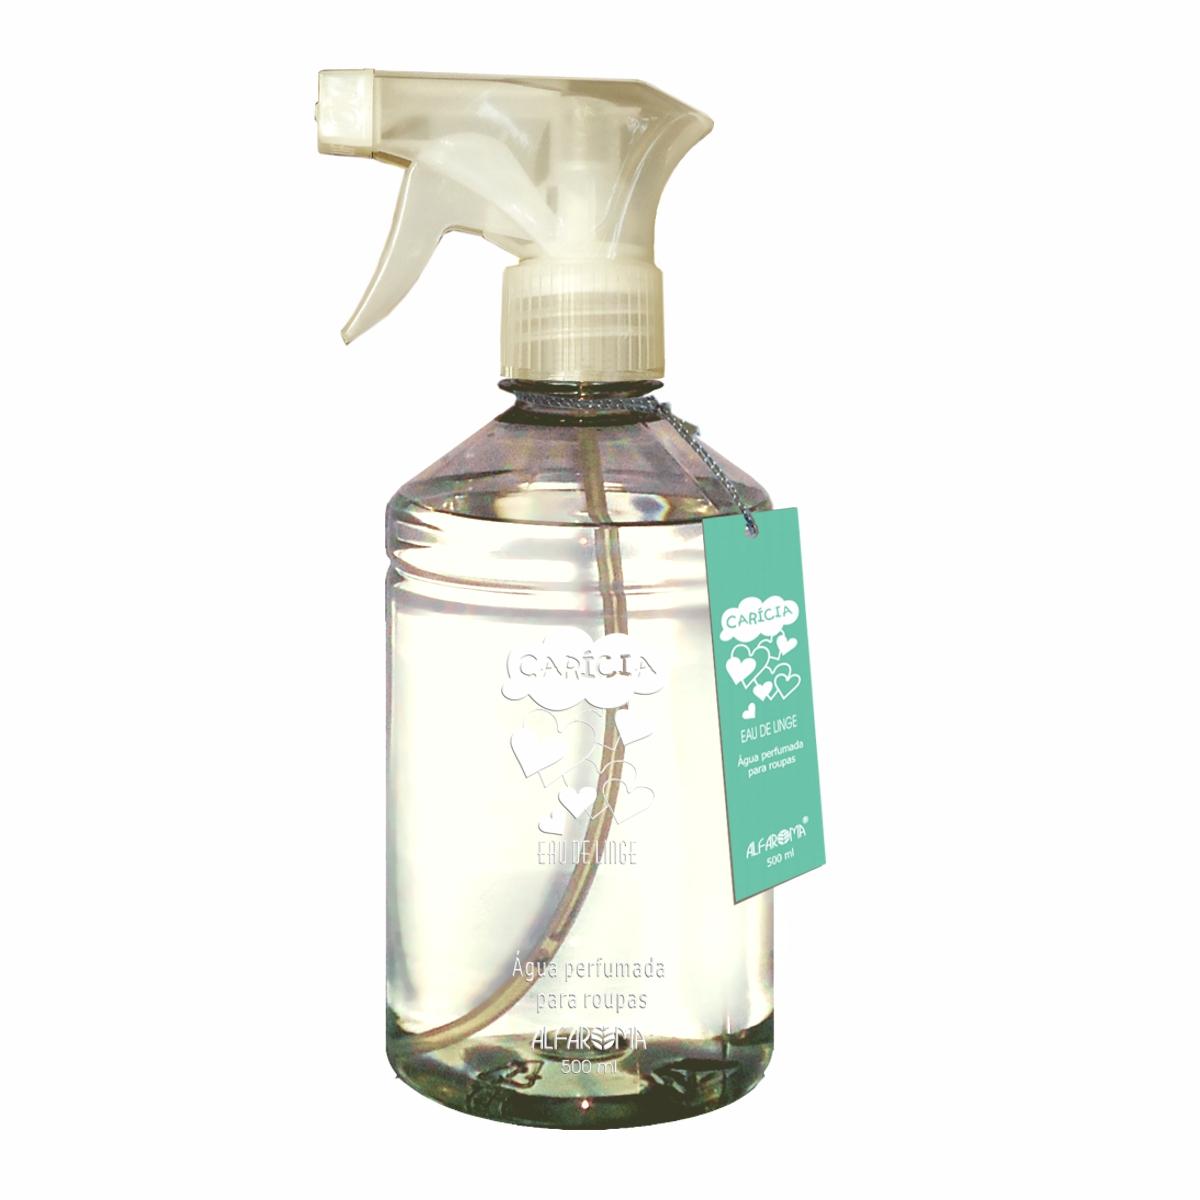 Água Perfumada para Roupas Carícia Alfaroma 500 ml